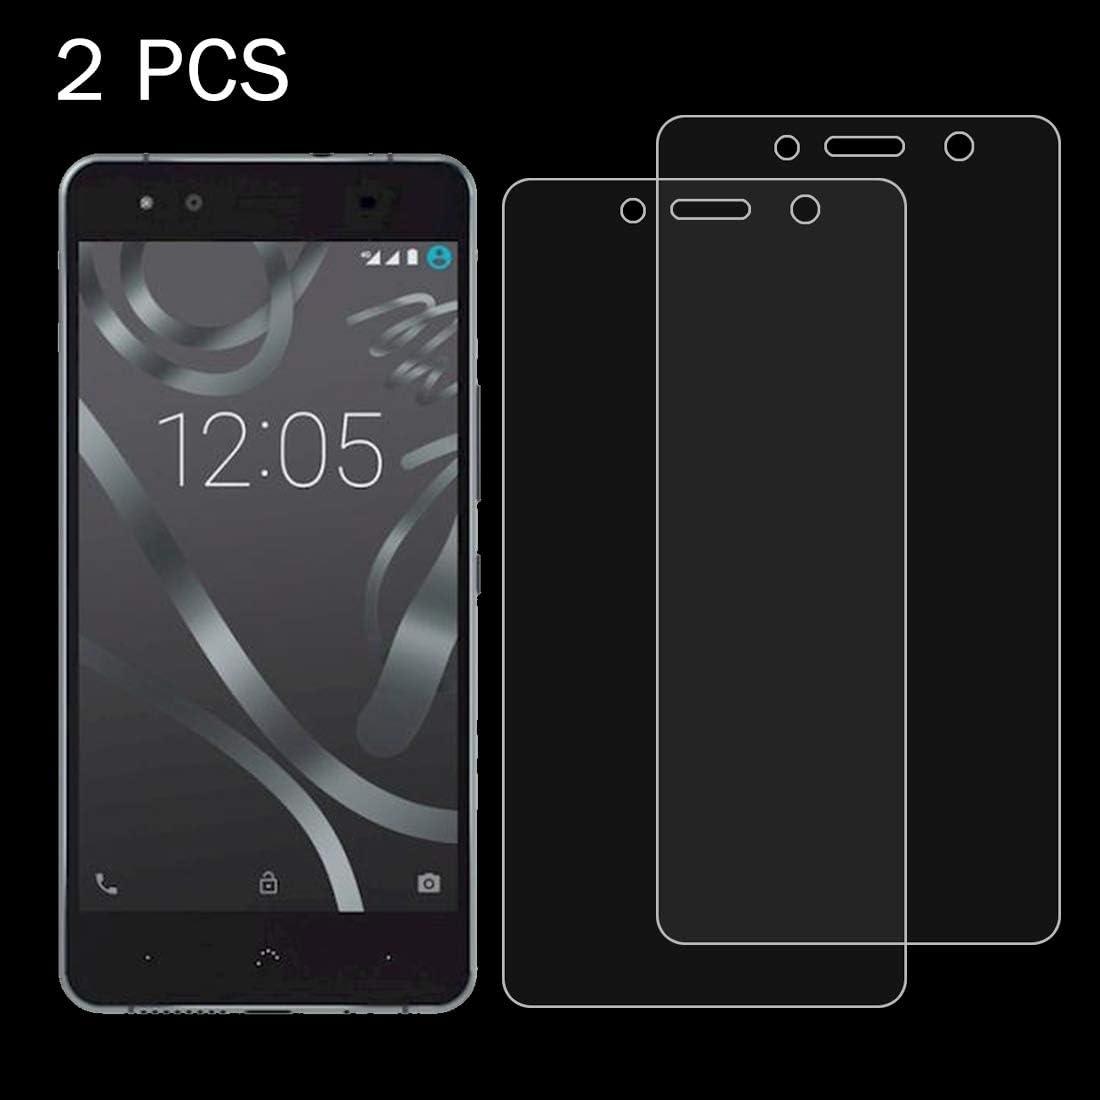 Funda Impermeable para Smartphone 2 PCS para BQ Aquaris X5 Plus ...